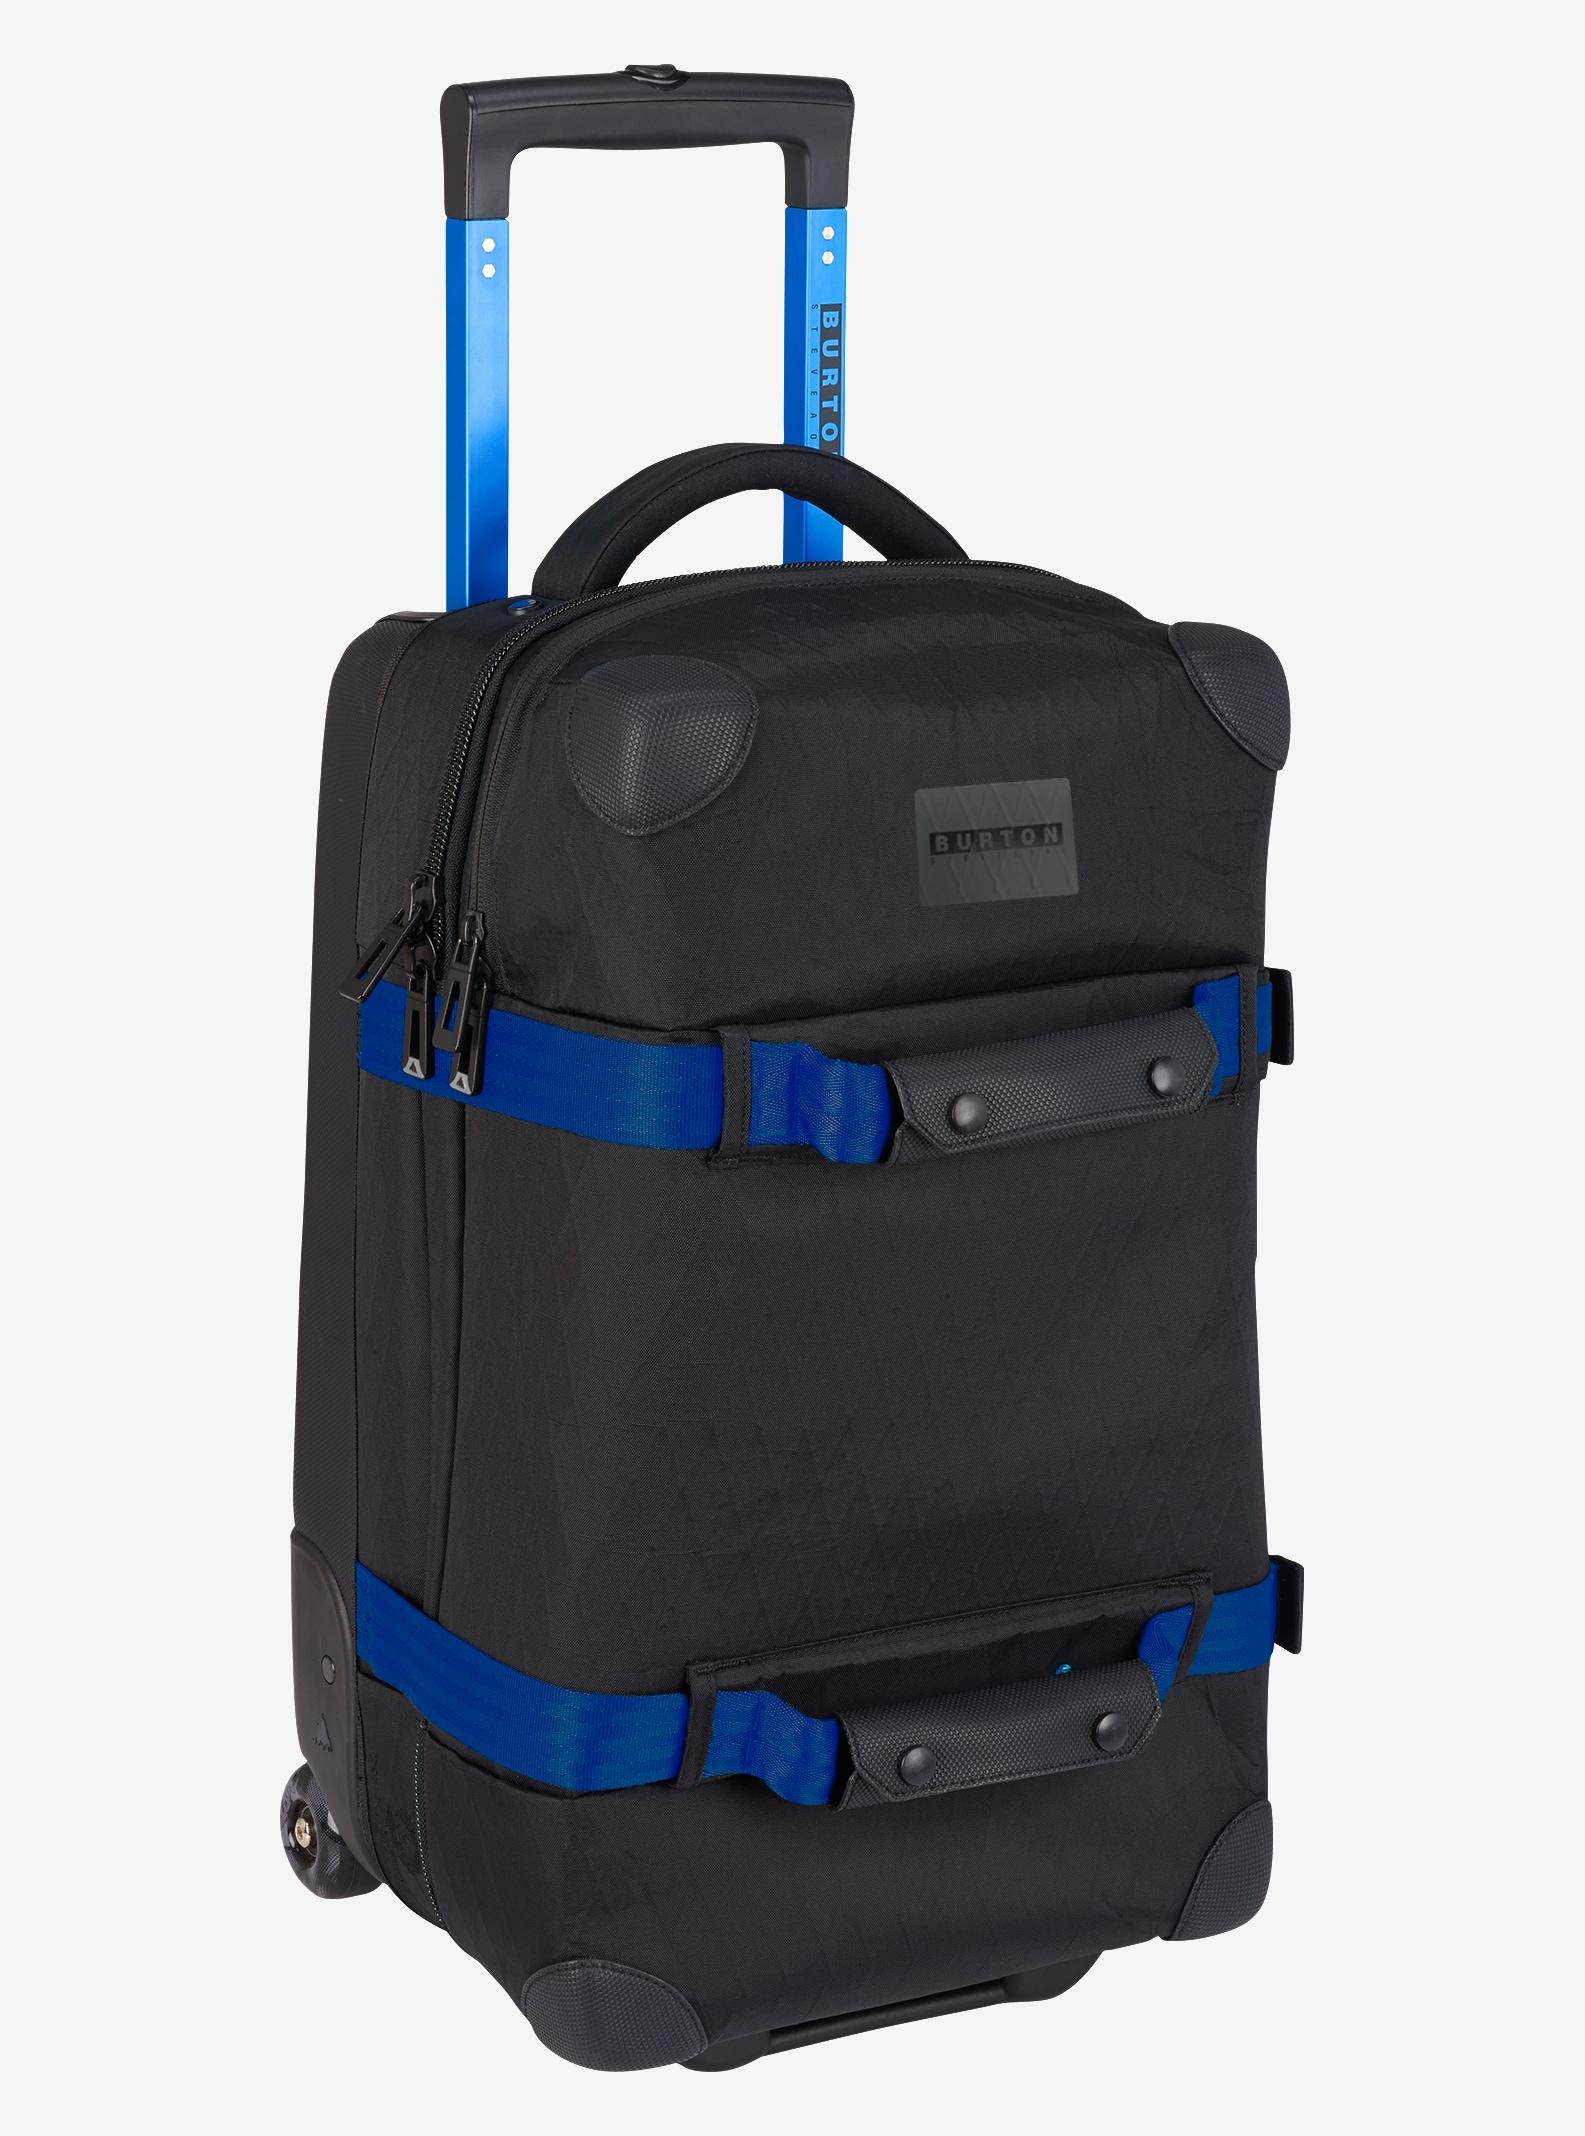 Burton x Aoki Wheelie Flight Deck Travel Bag shown in Aoki Black